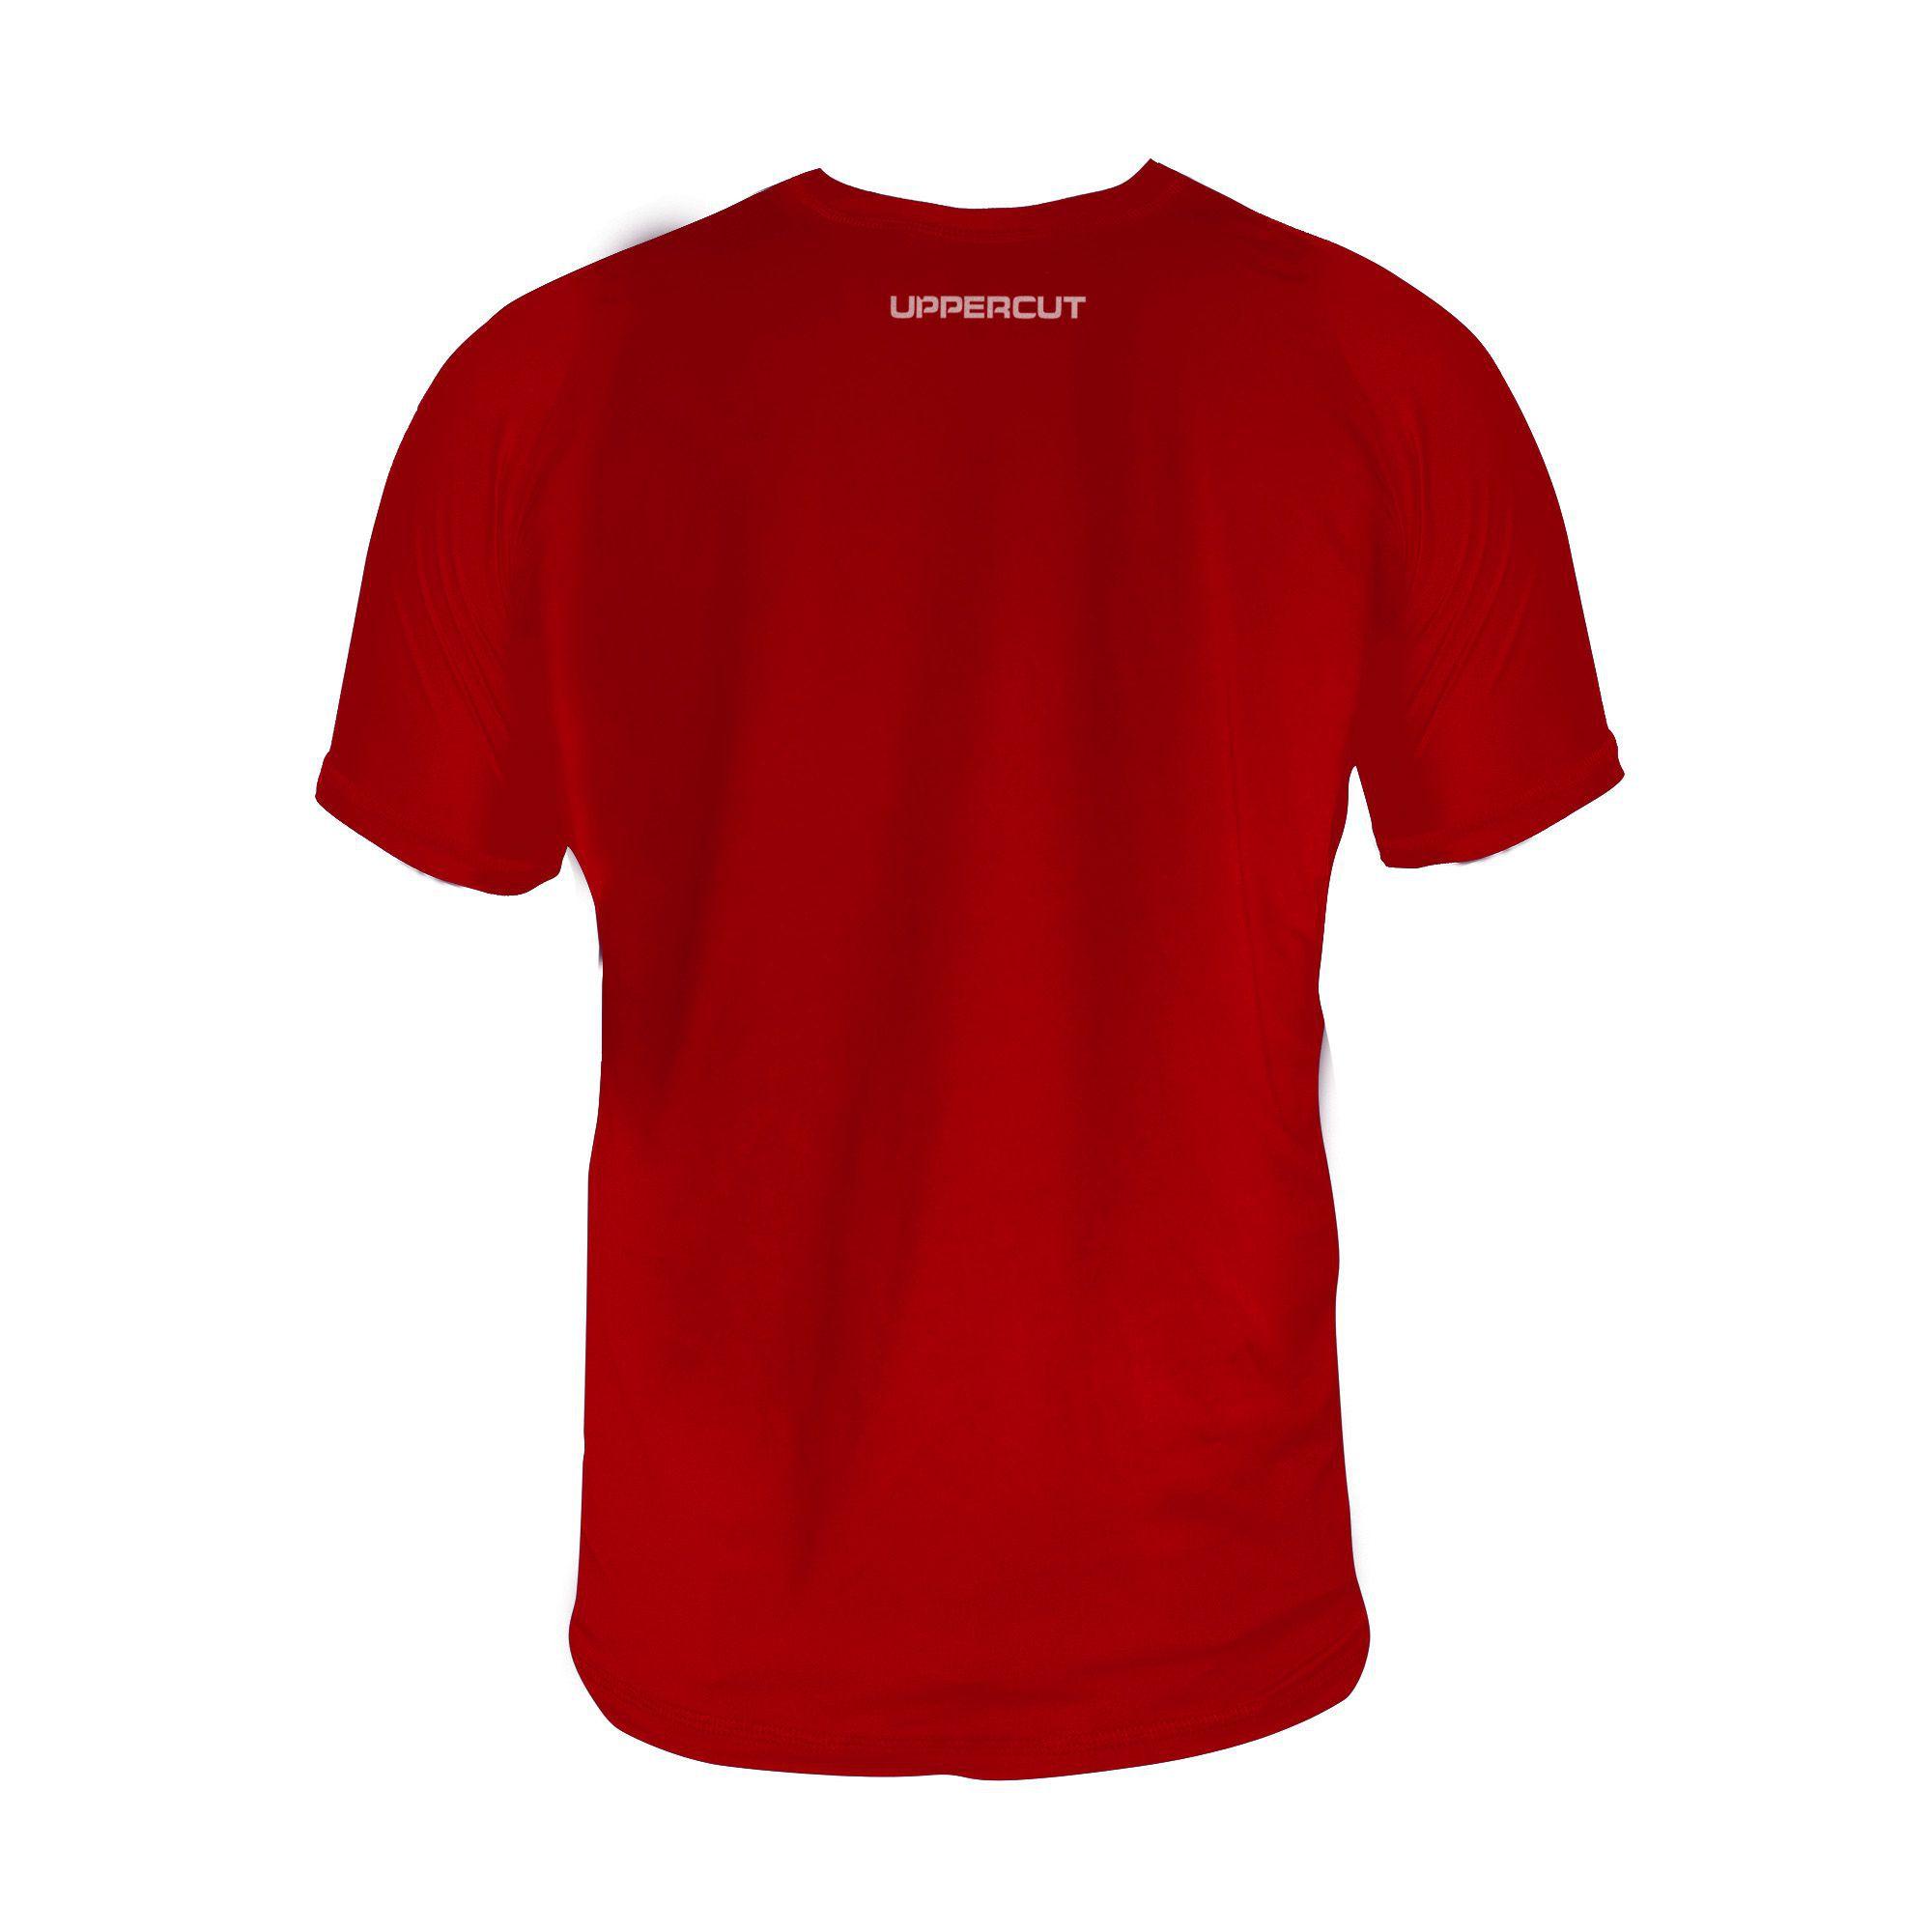 Camiseta Muay Thai U-092 - Treino Dry Fit UV50+ - Preta